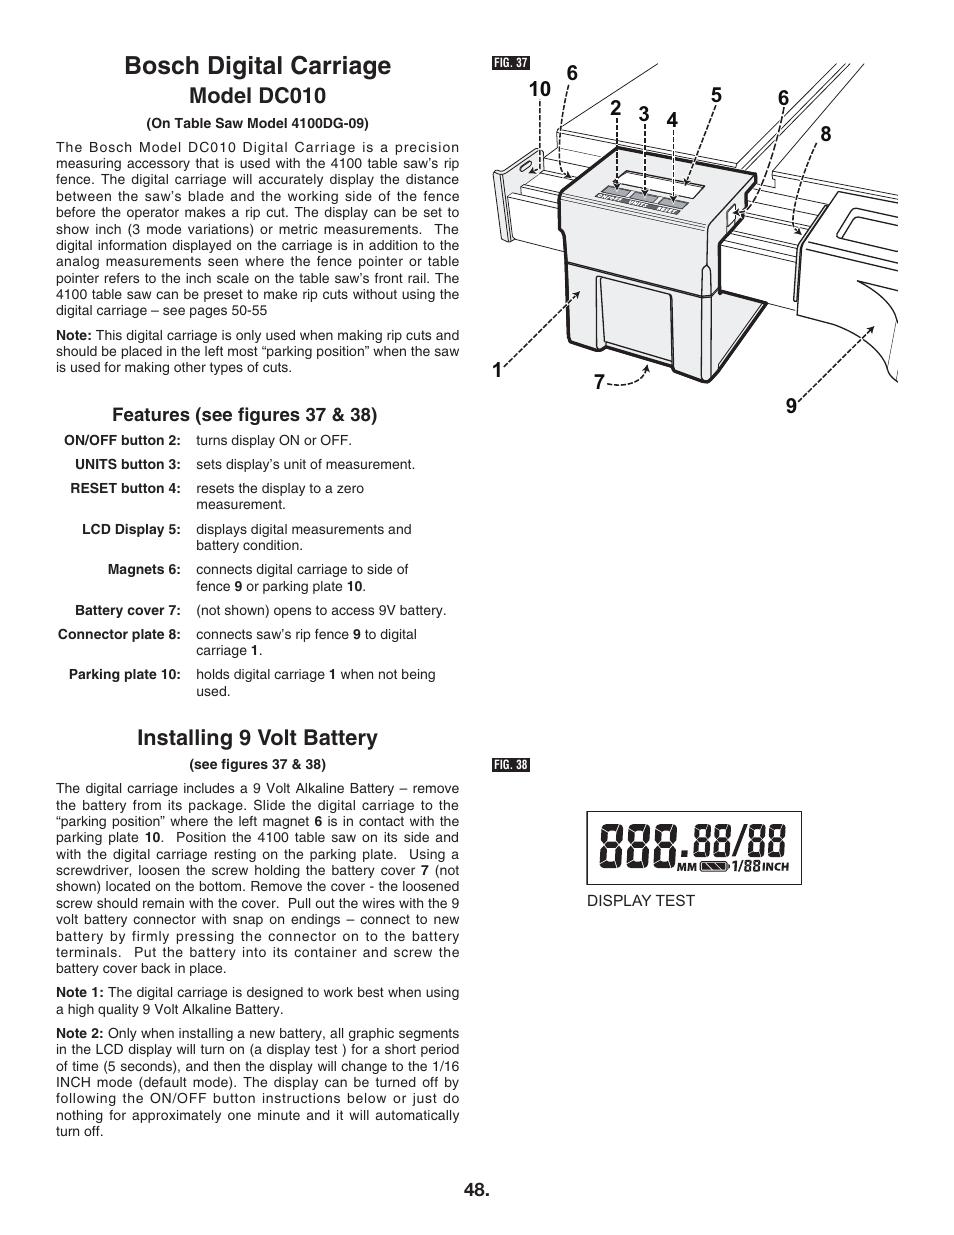 Bosch digital carriage, Model dc010, Installing 9 volt